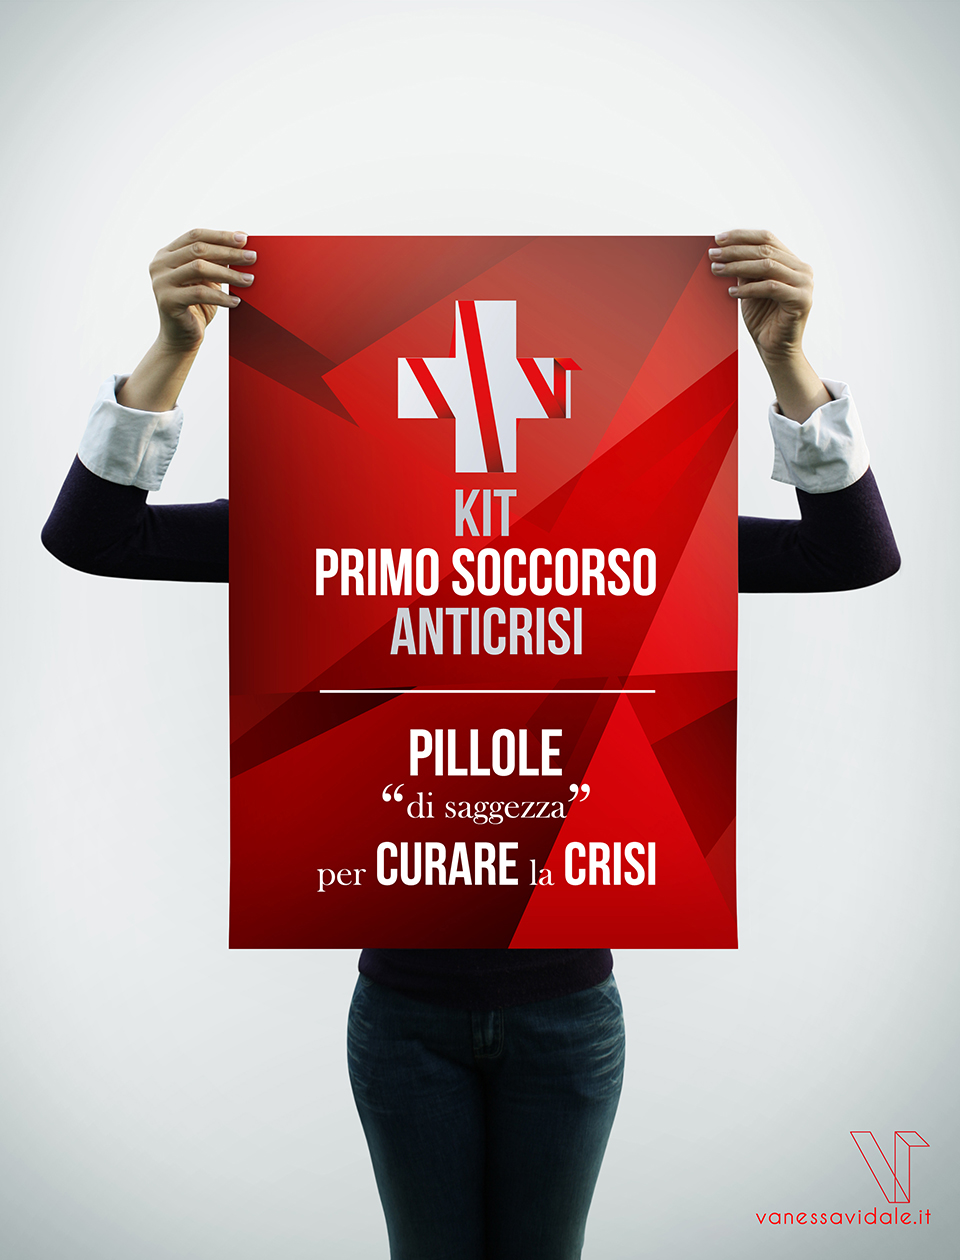 KitFirstAid_1-vanessa-vidale